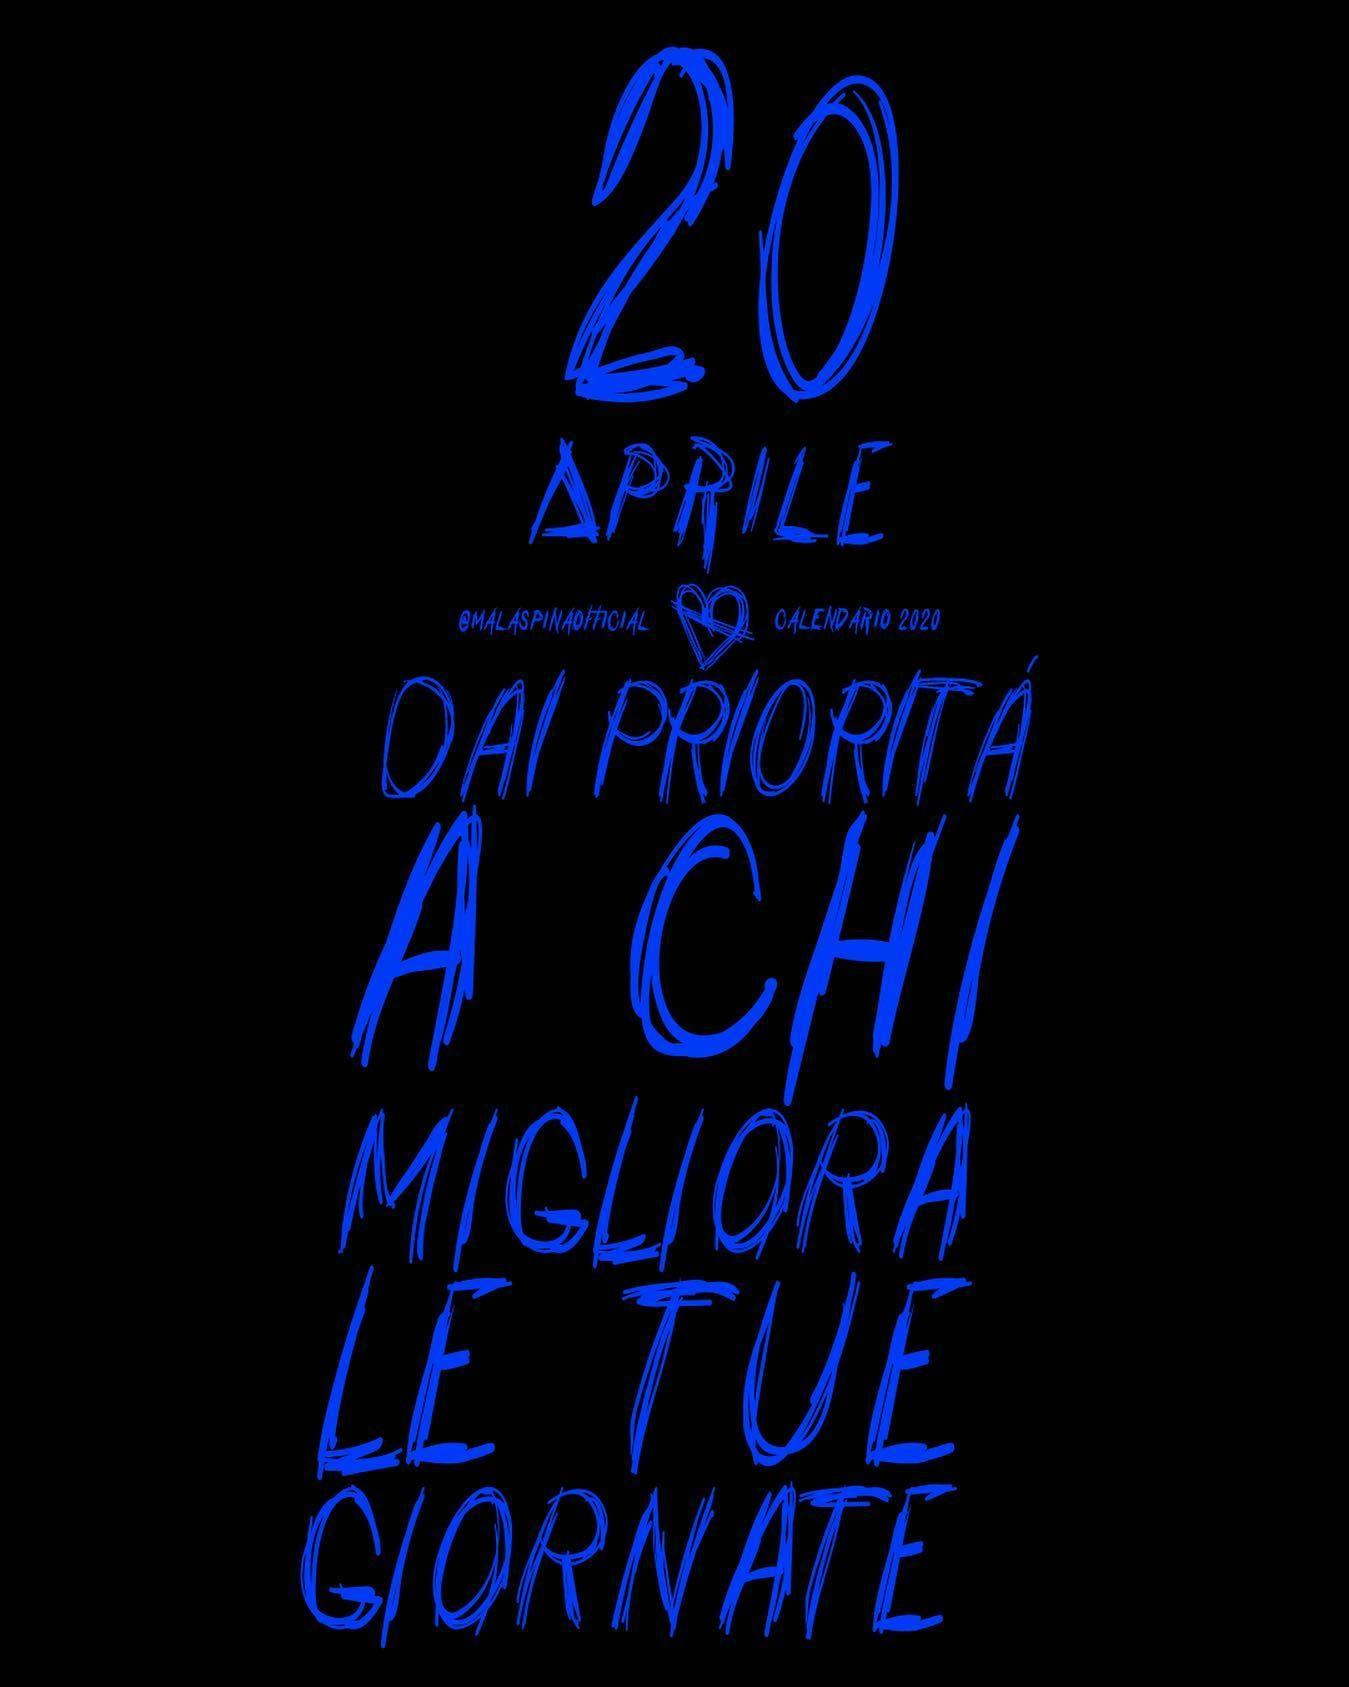 // TAGGA CHI MIGLIORA LE TUE GIORNATE #malaspina #malaspinaofficial #essere #frasibellissime #citazioni #frasilibri #aforismi #pensieri #frasidamore #aesthetic #frasi #frasitop #frasibelle #frasitumblr #frasivere #frasiitaliane #frasisignificative #felicità #pensiero #vita #amore #tiamo #tumblrgirl #tumblr #frasiitaliane #mimanchi #amicizia #netflix